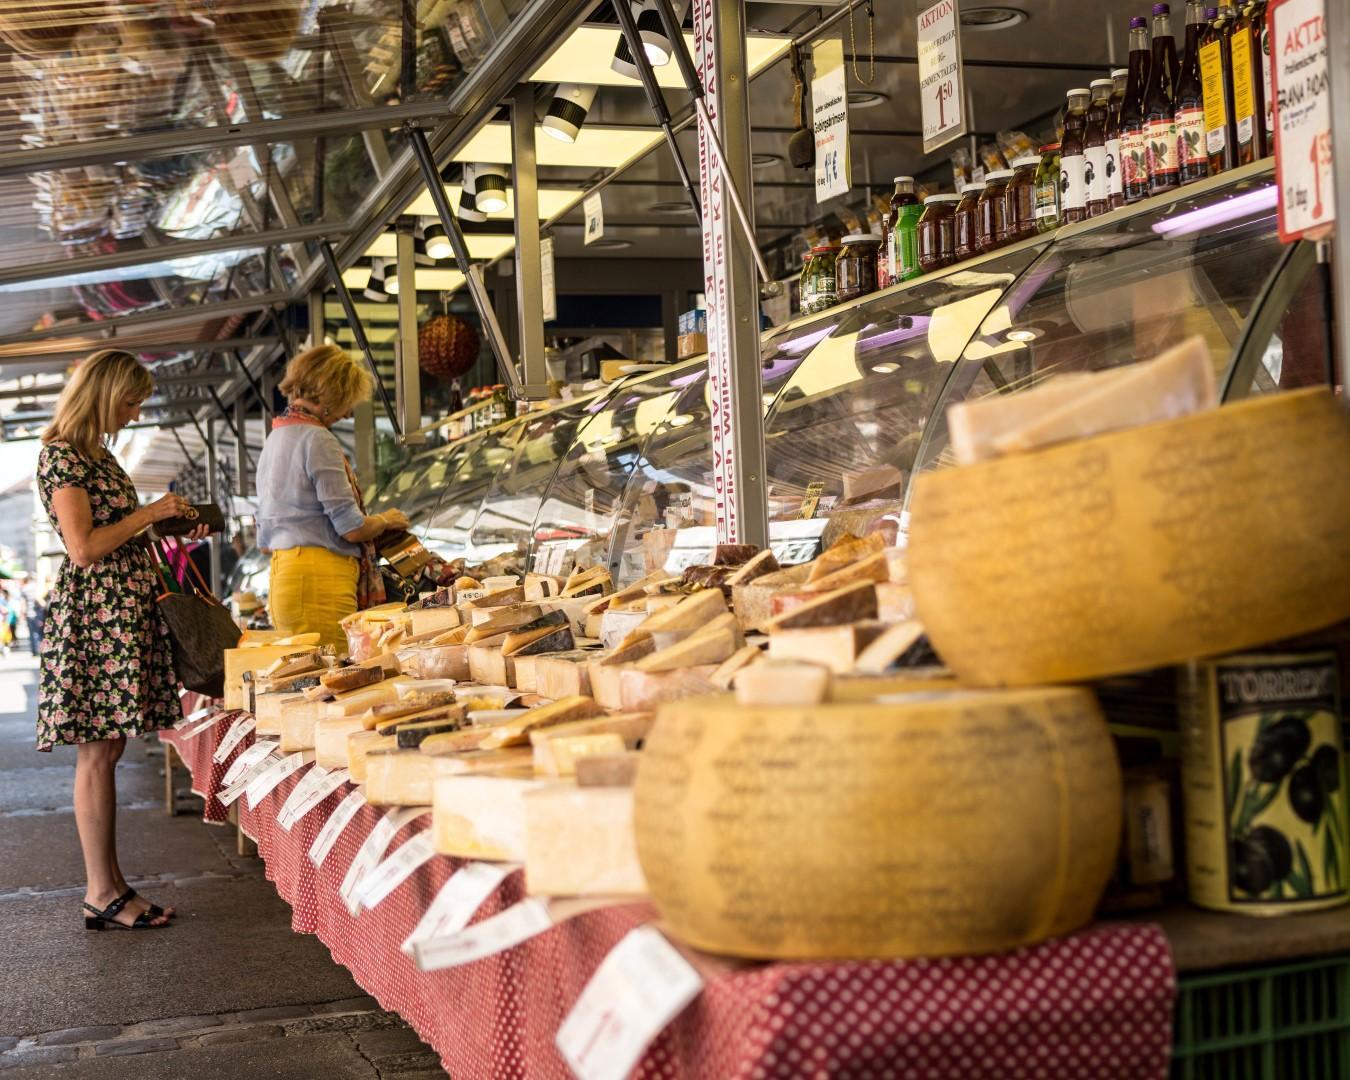 Shopping mitteleuropeo nei mercati di Vienna